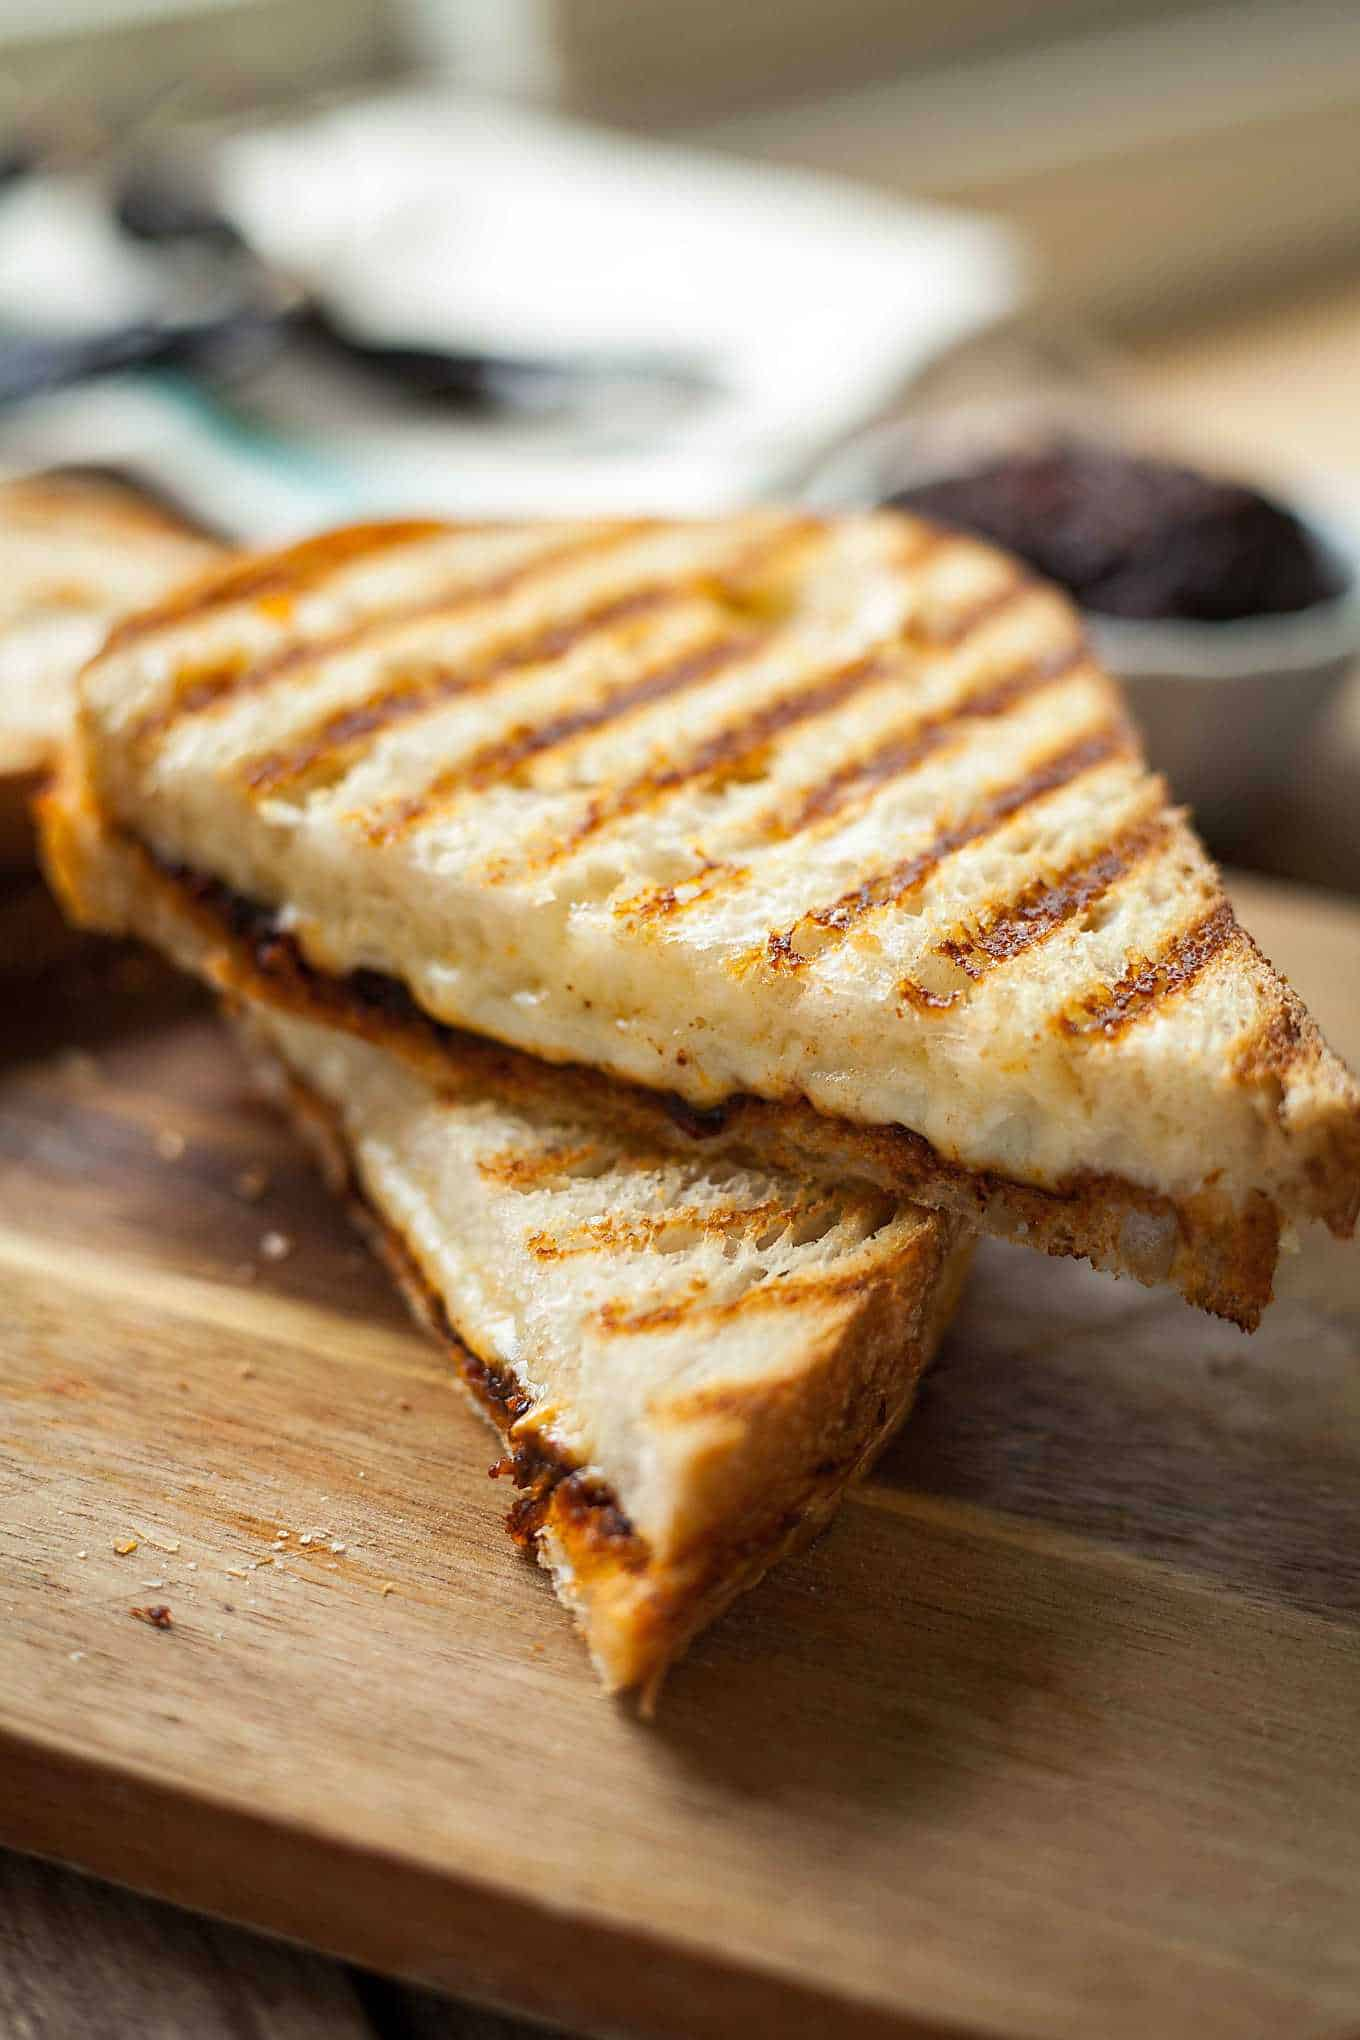 a grilled cheese sandwich cut in half